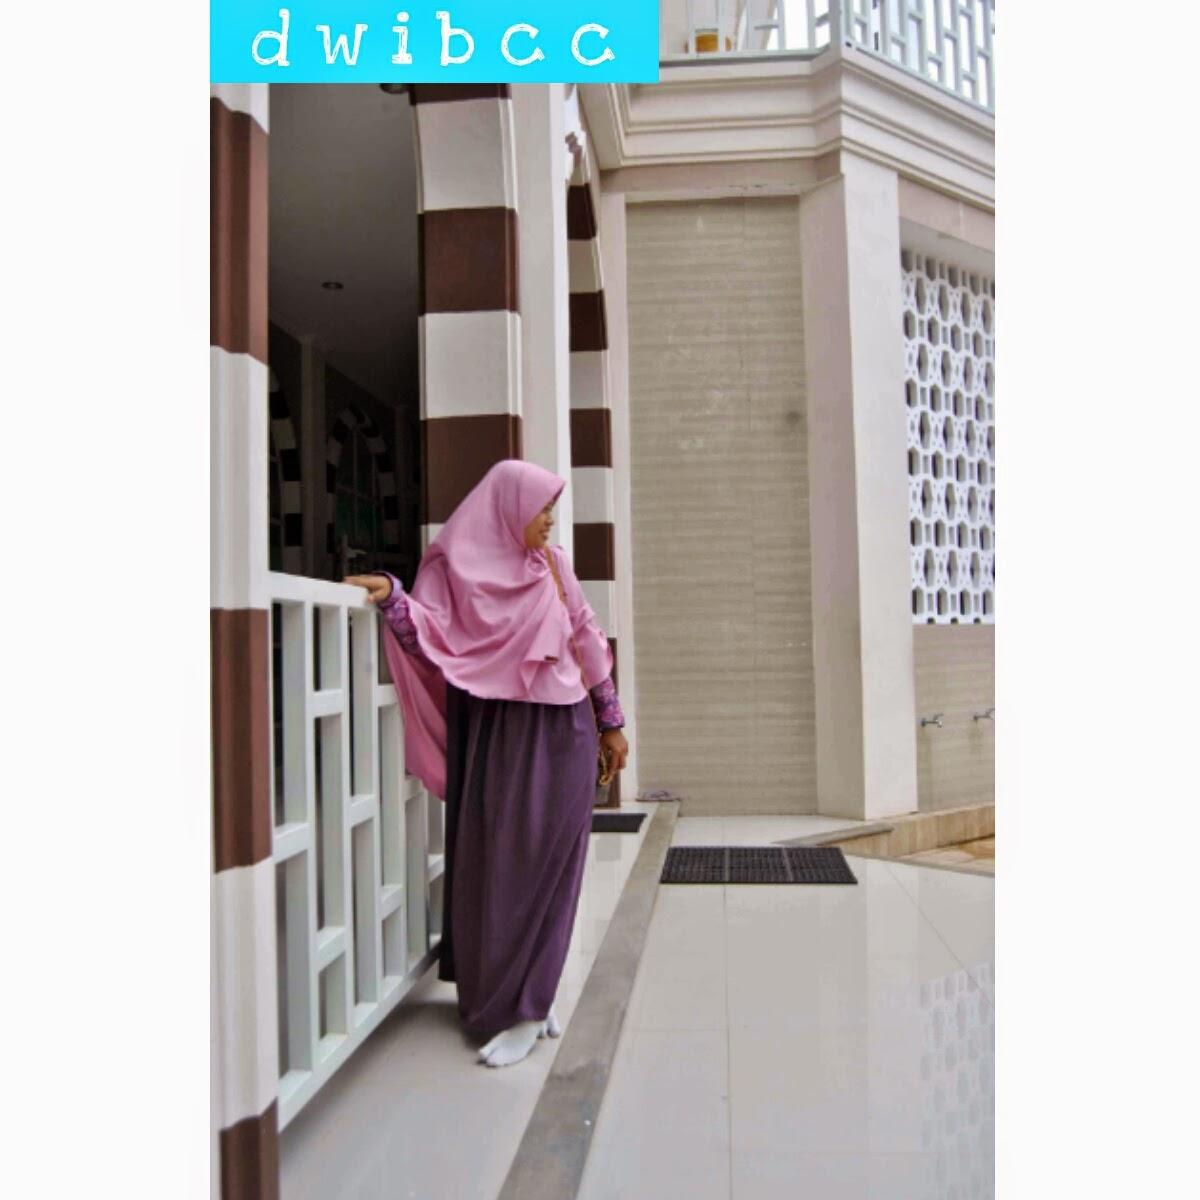 photography muslimah syar'i  dwibcc